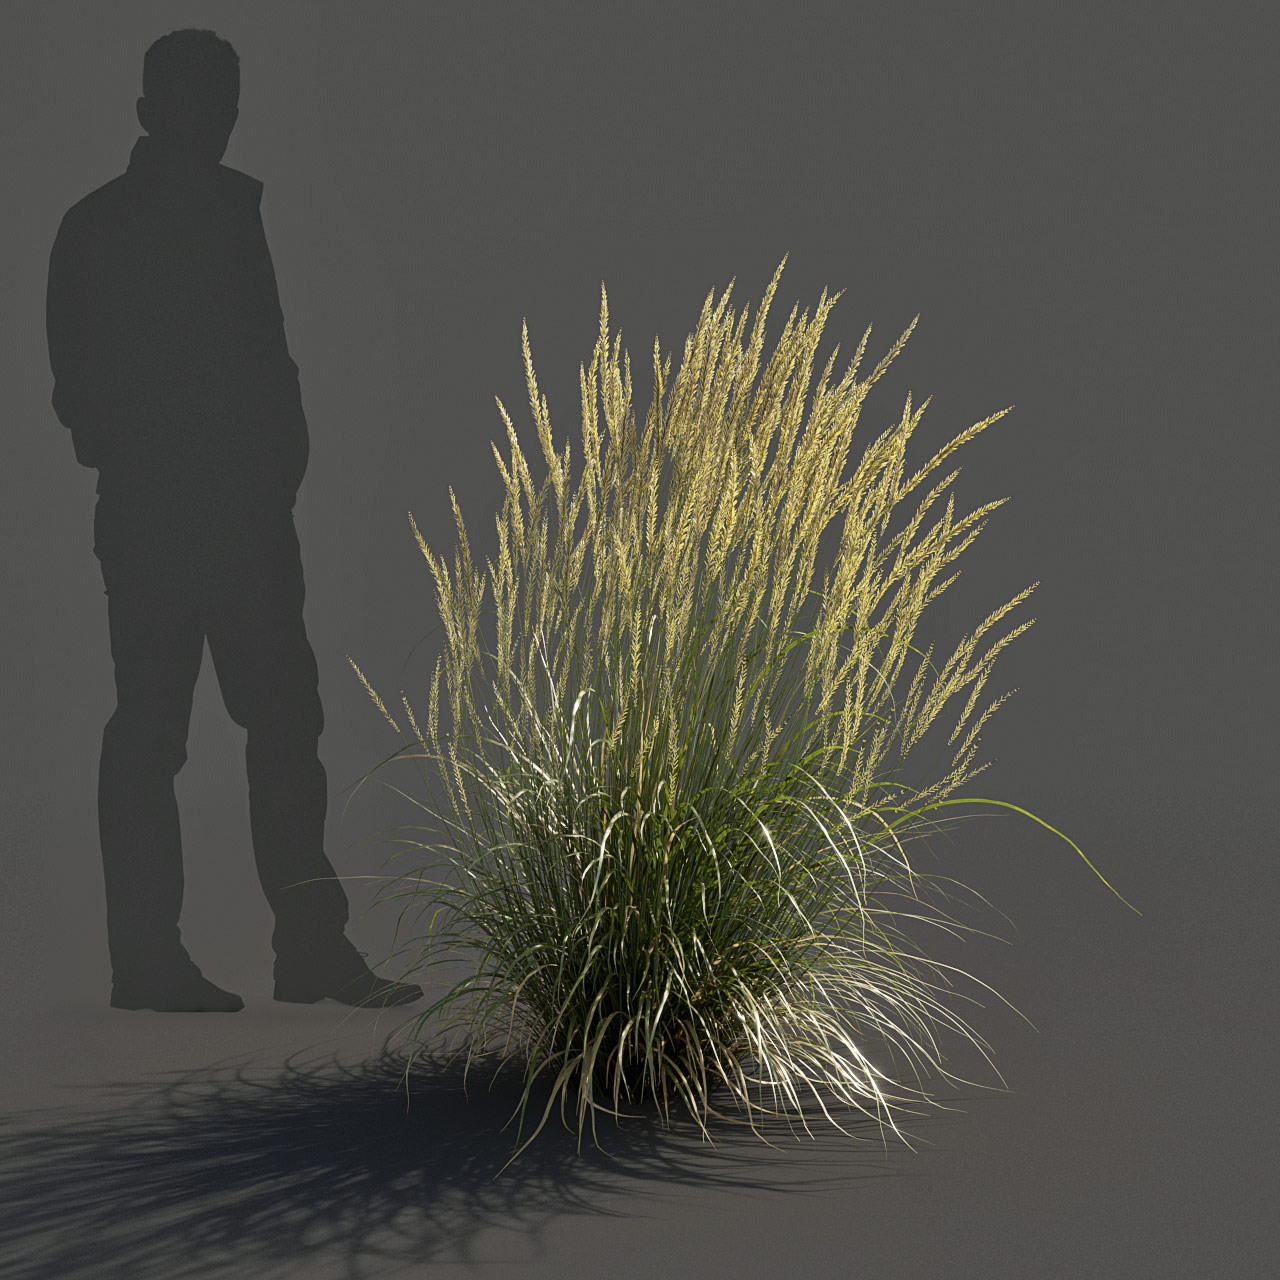 Feather Reed Grass 3D model medium_v01 -  'Karl Foerster' - Calamagrostis acutiflora